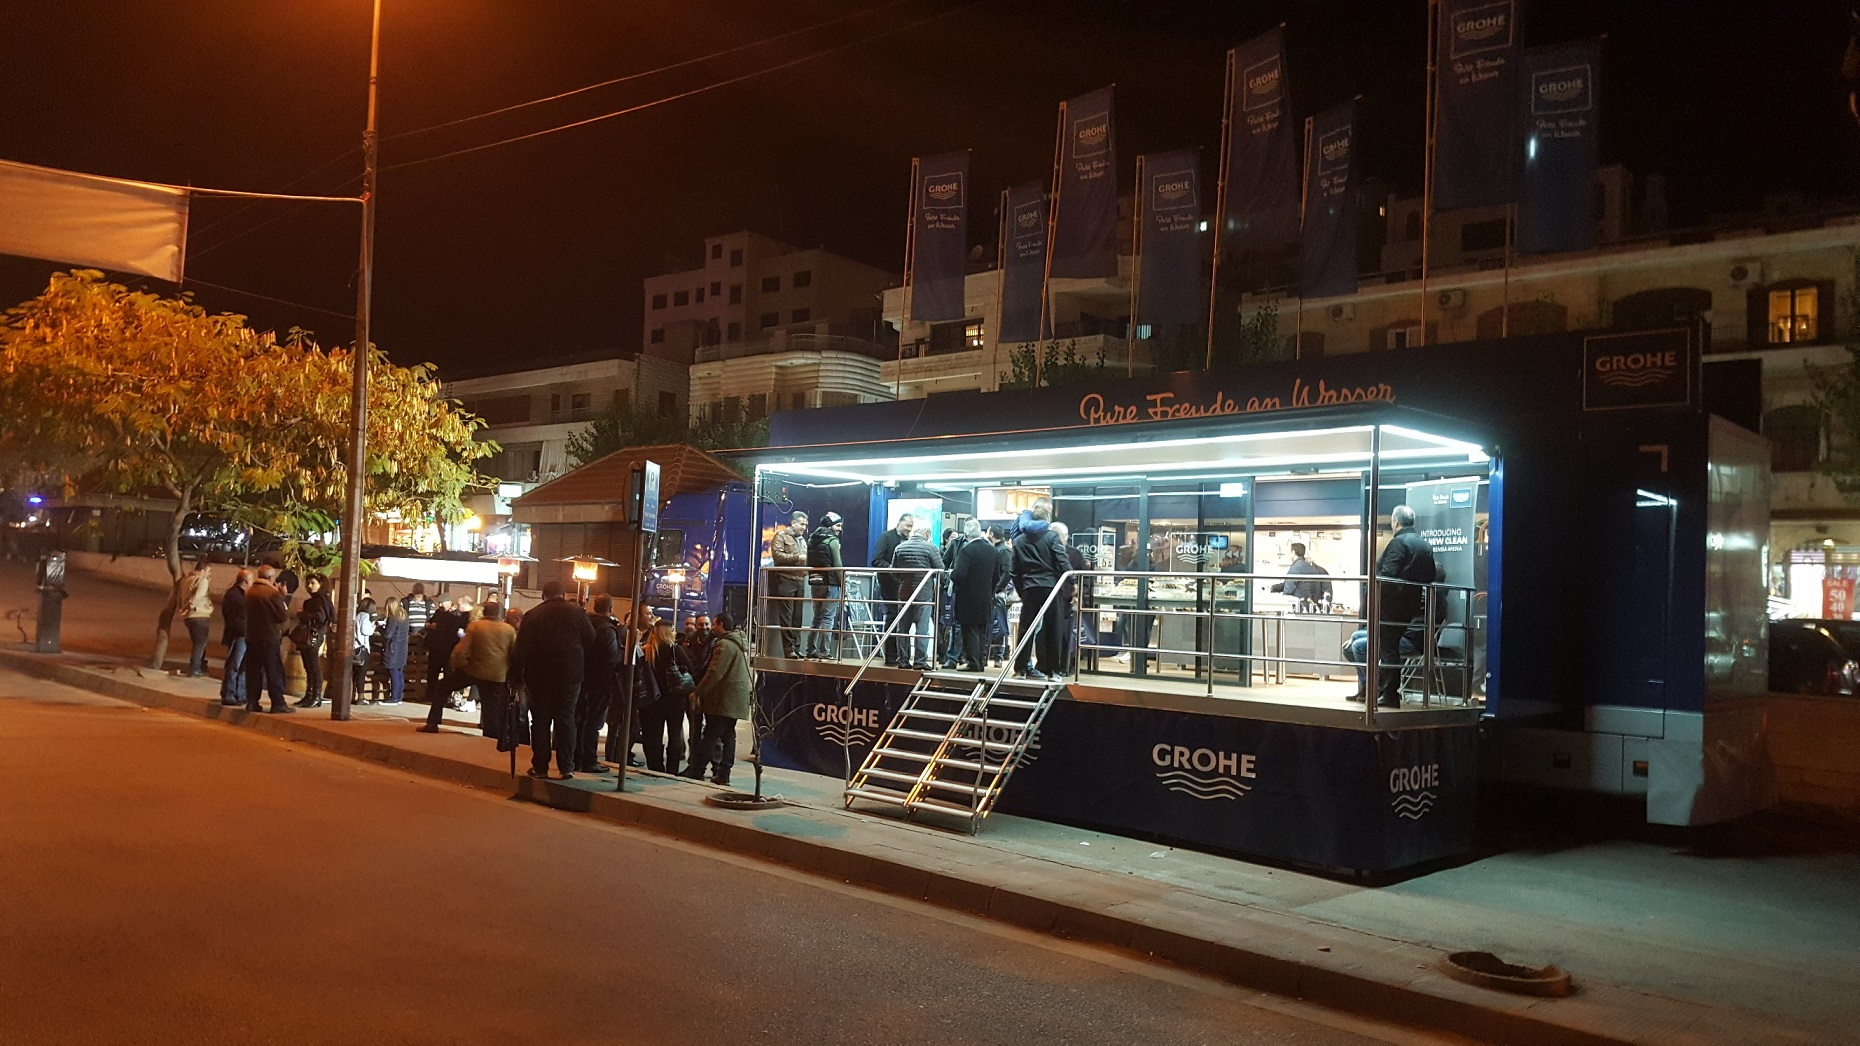 GROHE Truck Tour Lebanon (2)